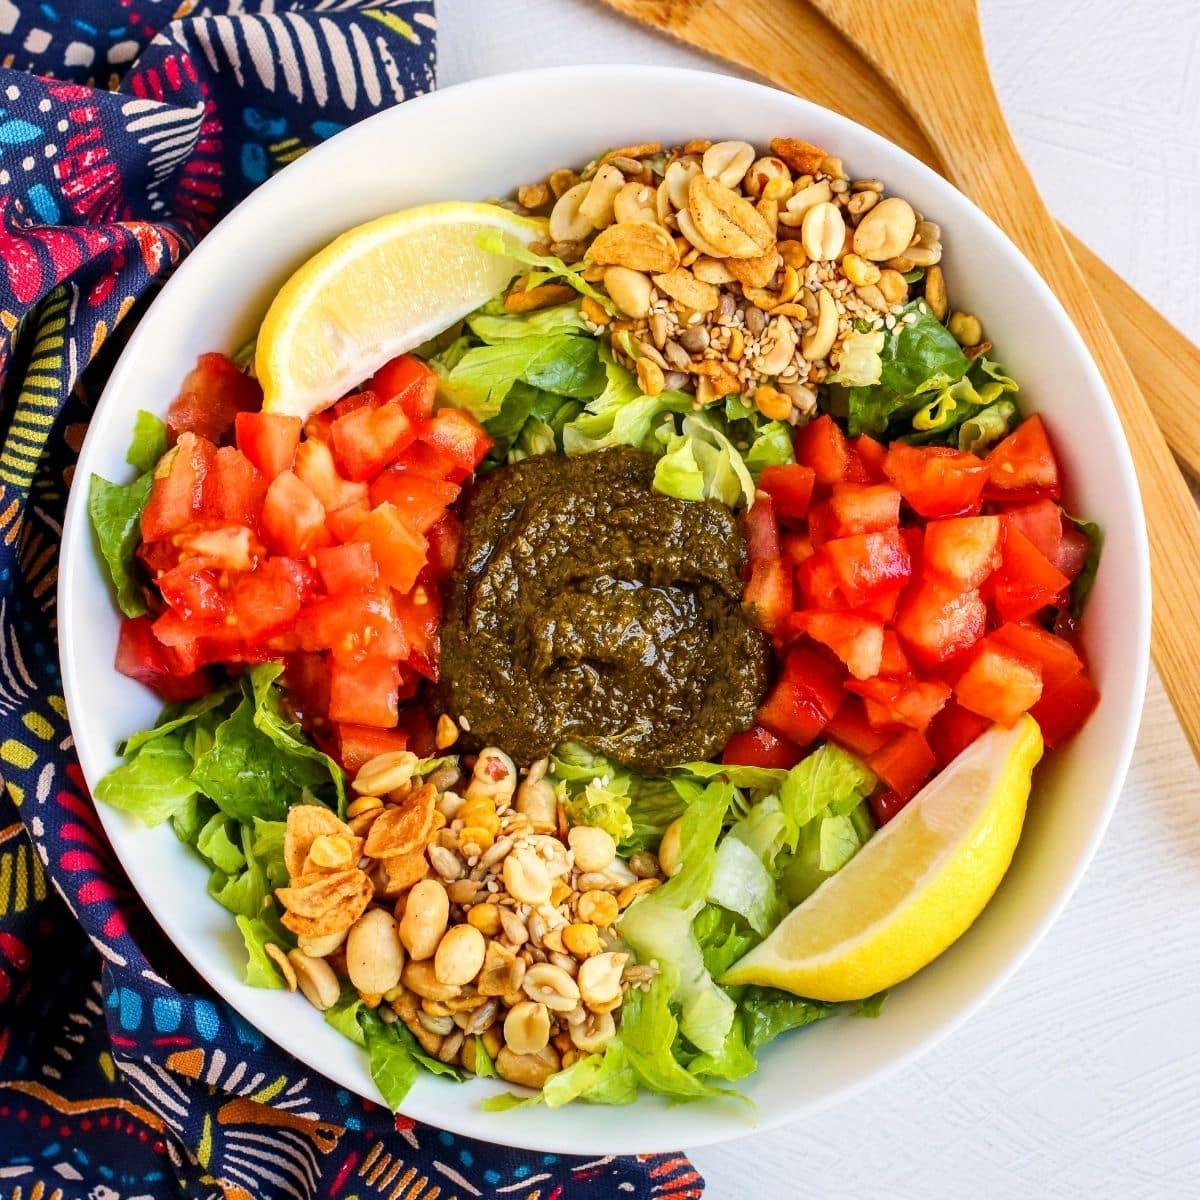 Bowl of Tea Leaf Salad before being tossed